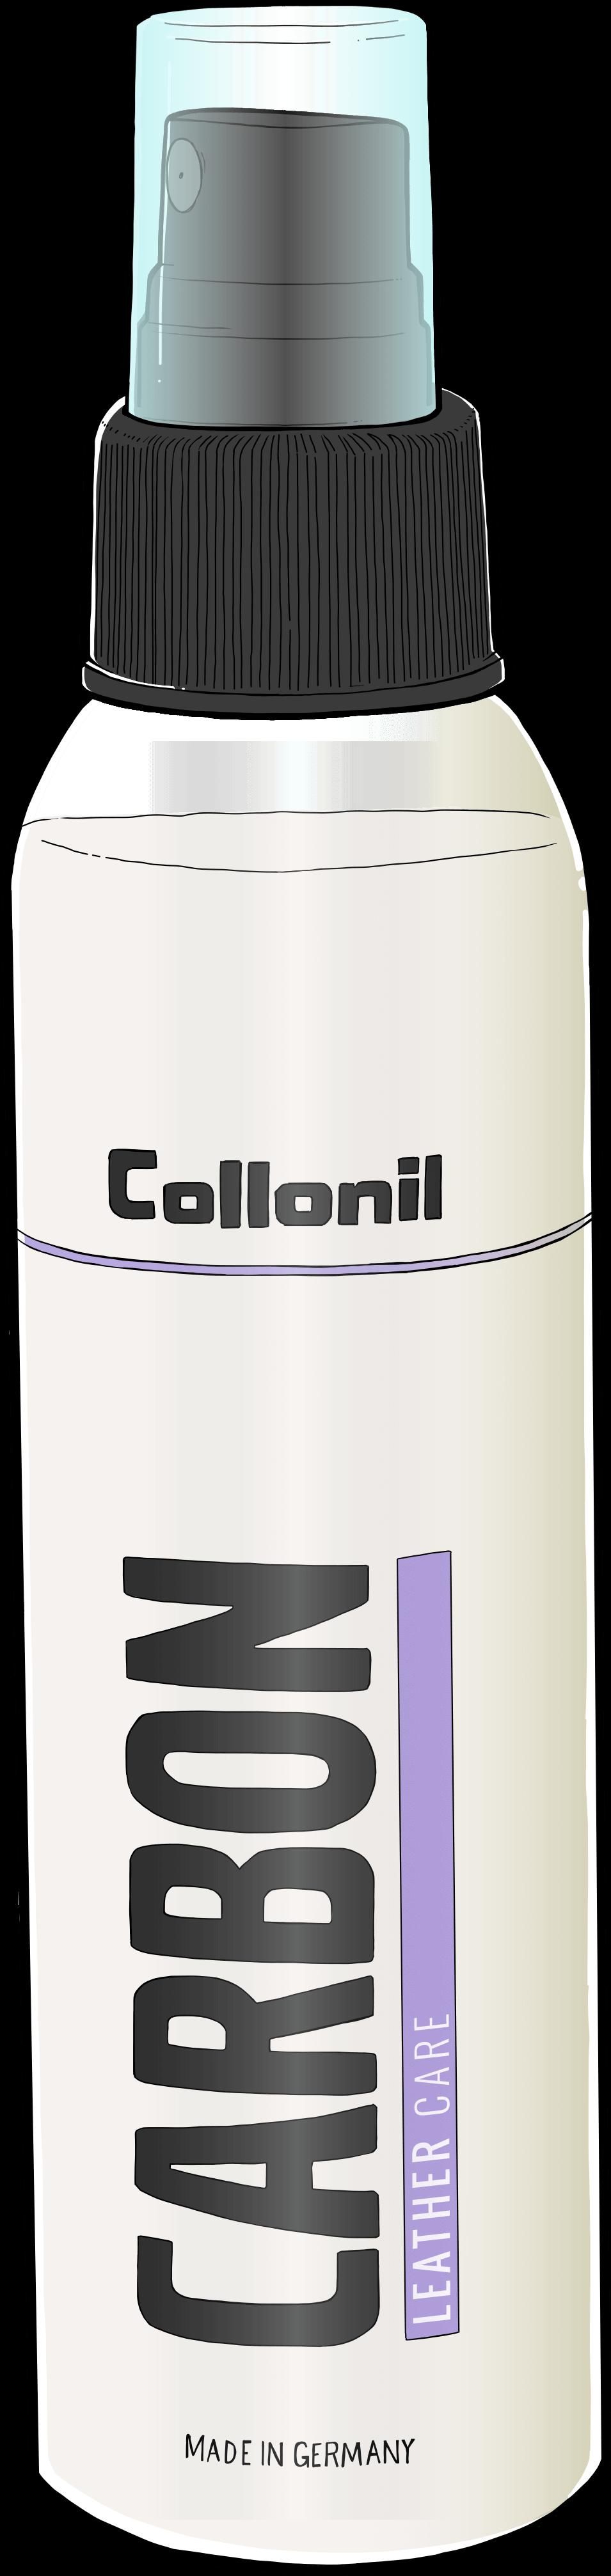 Collonil Leather Care